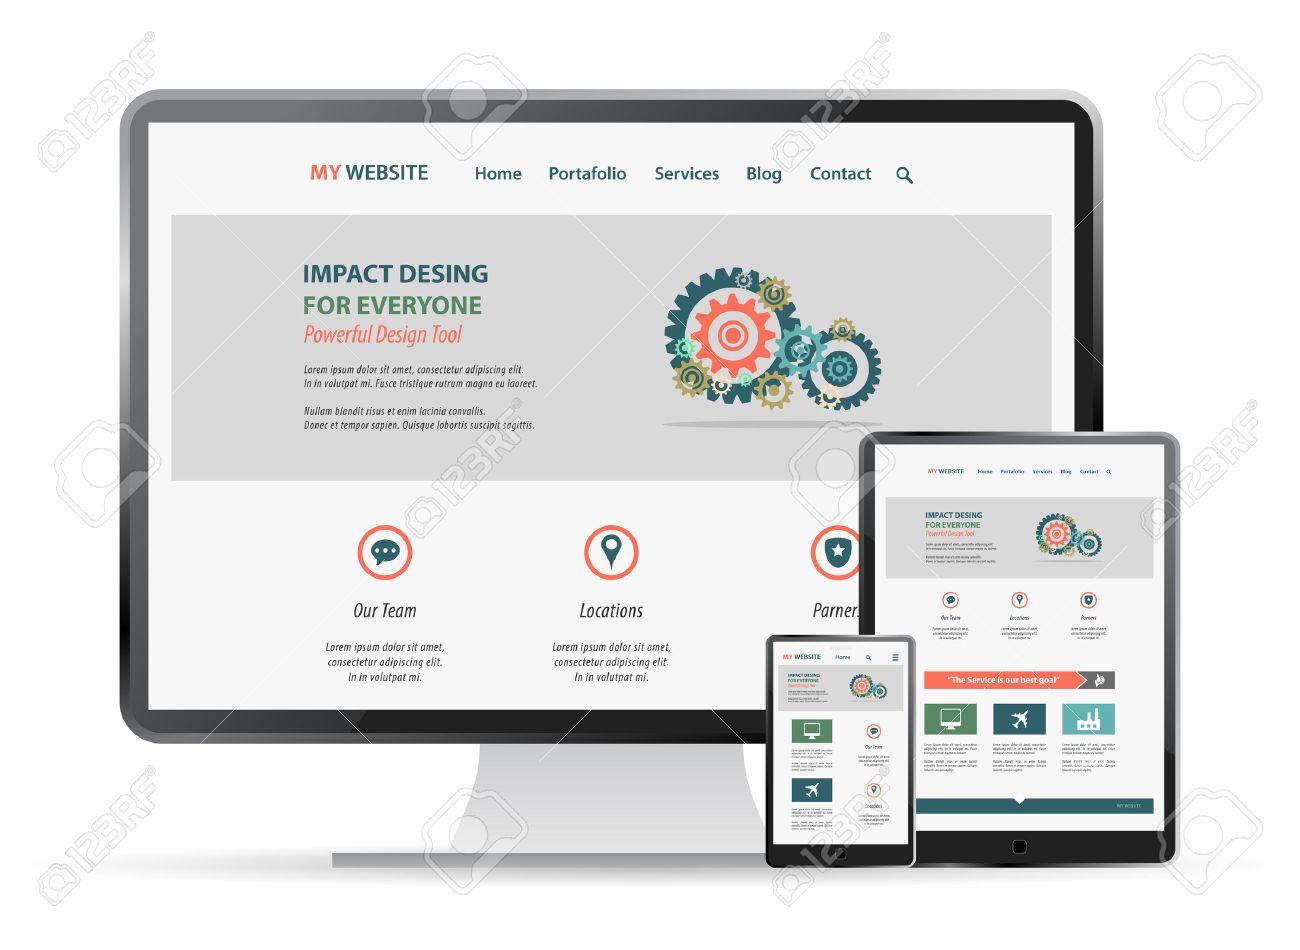 responsive web site design mockup - 41261152